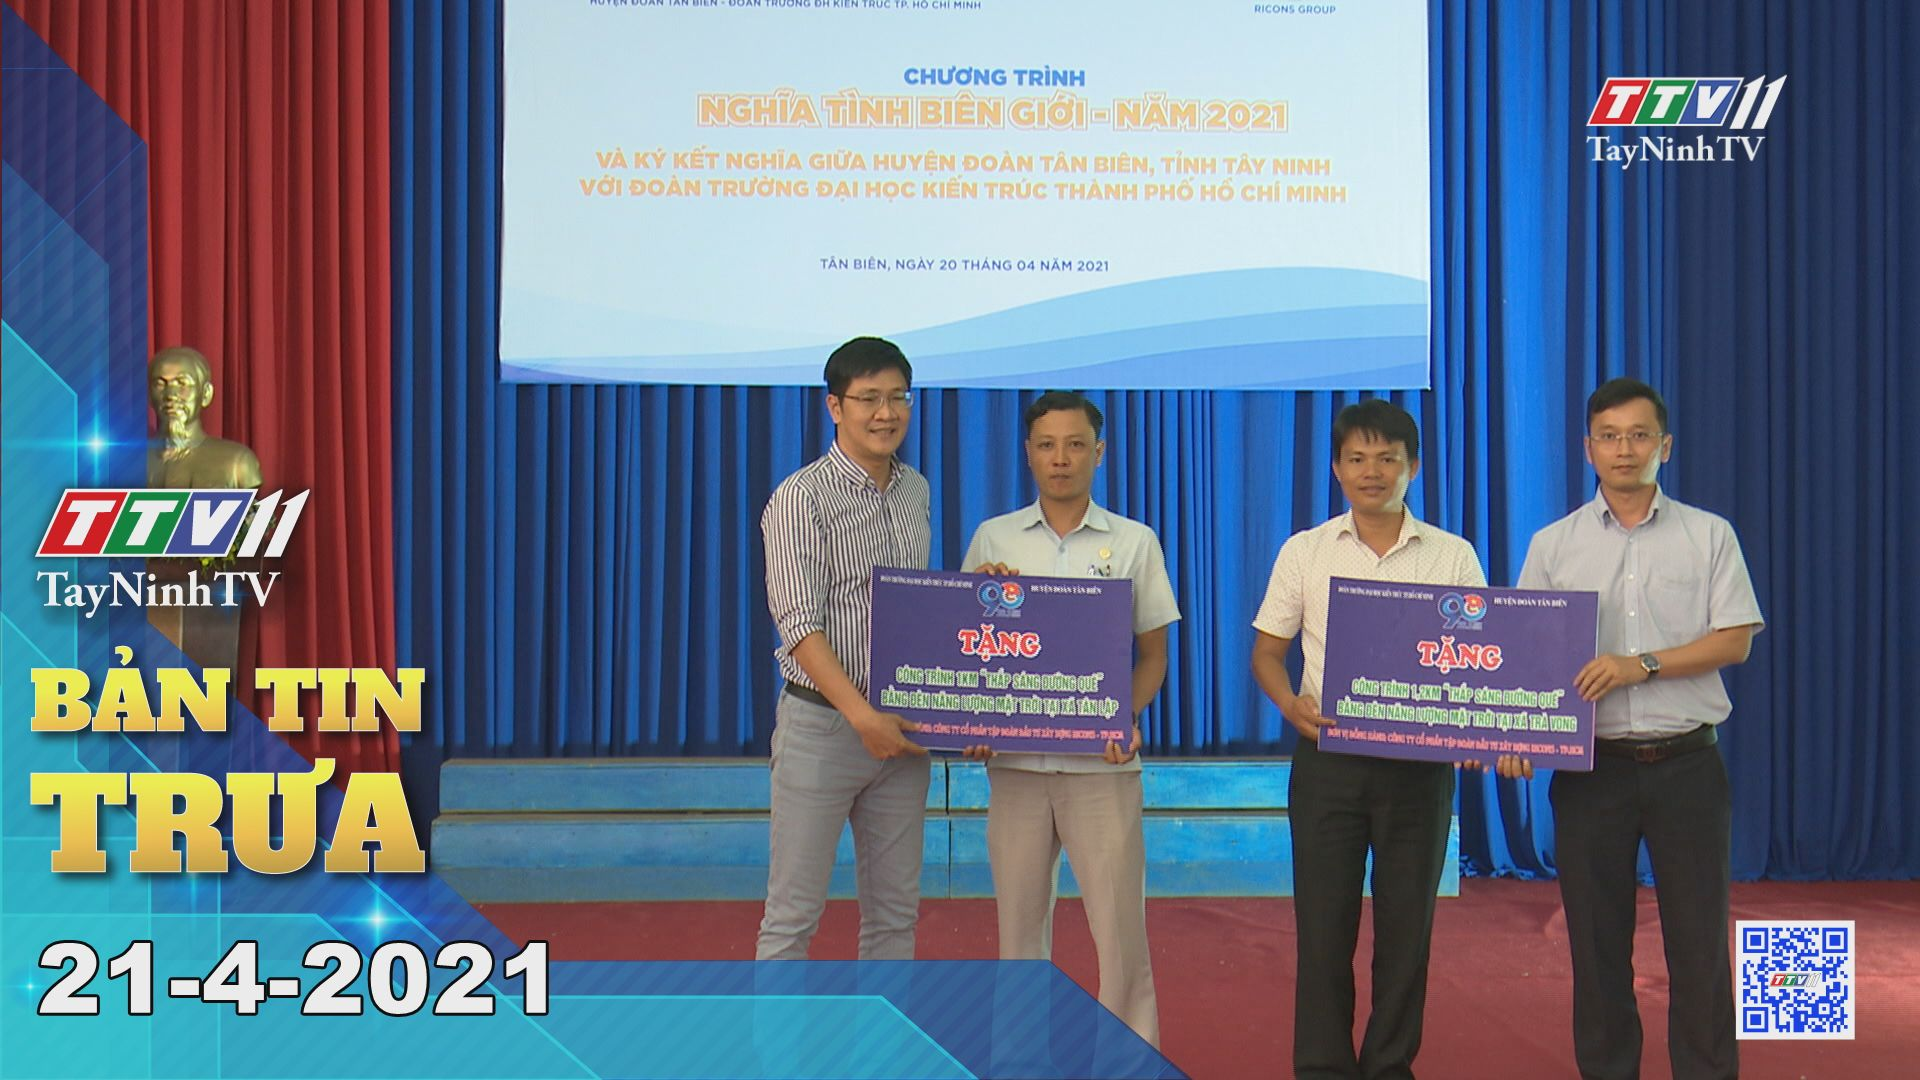 Bản tin trưa 21-4-2021 | Tin tức hôm nay | TayNinhTV